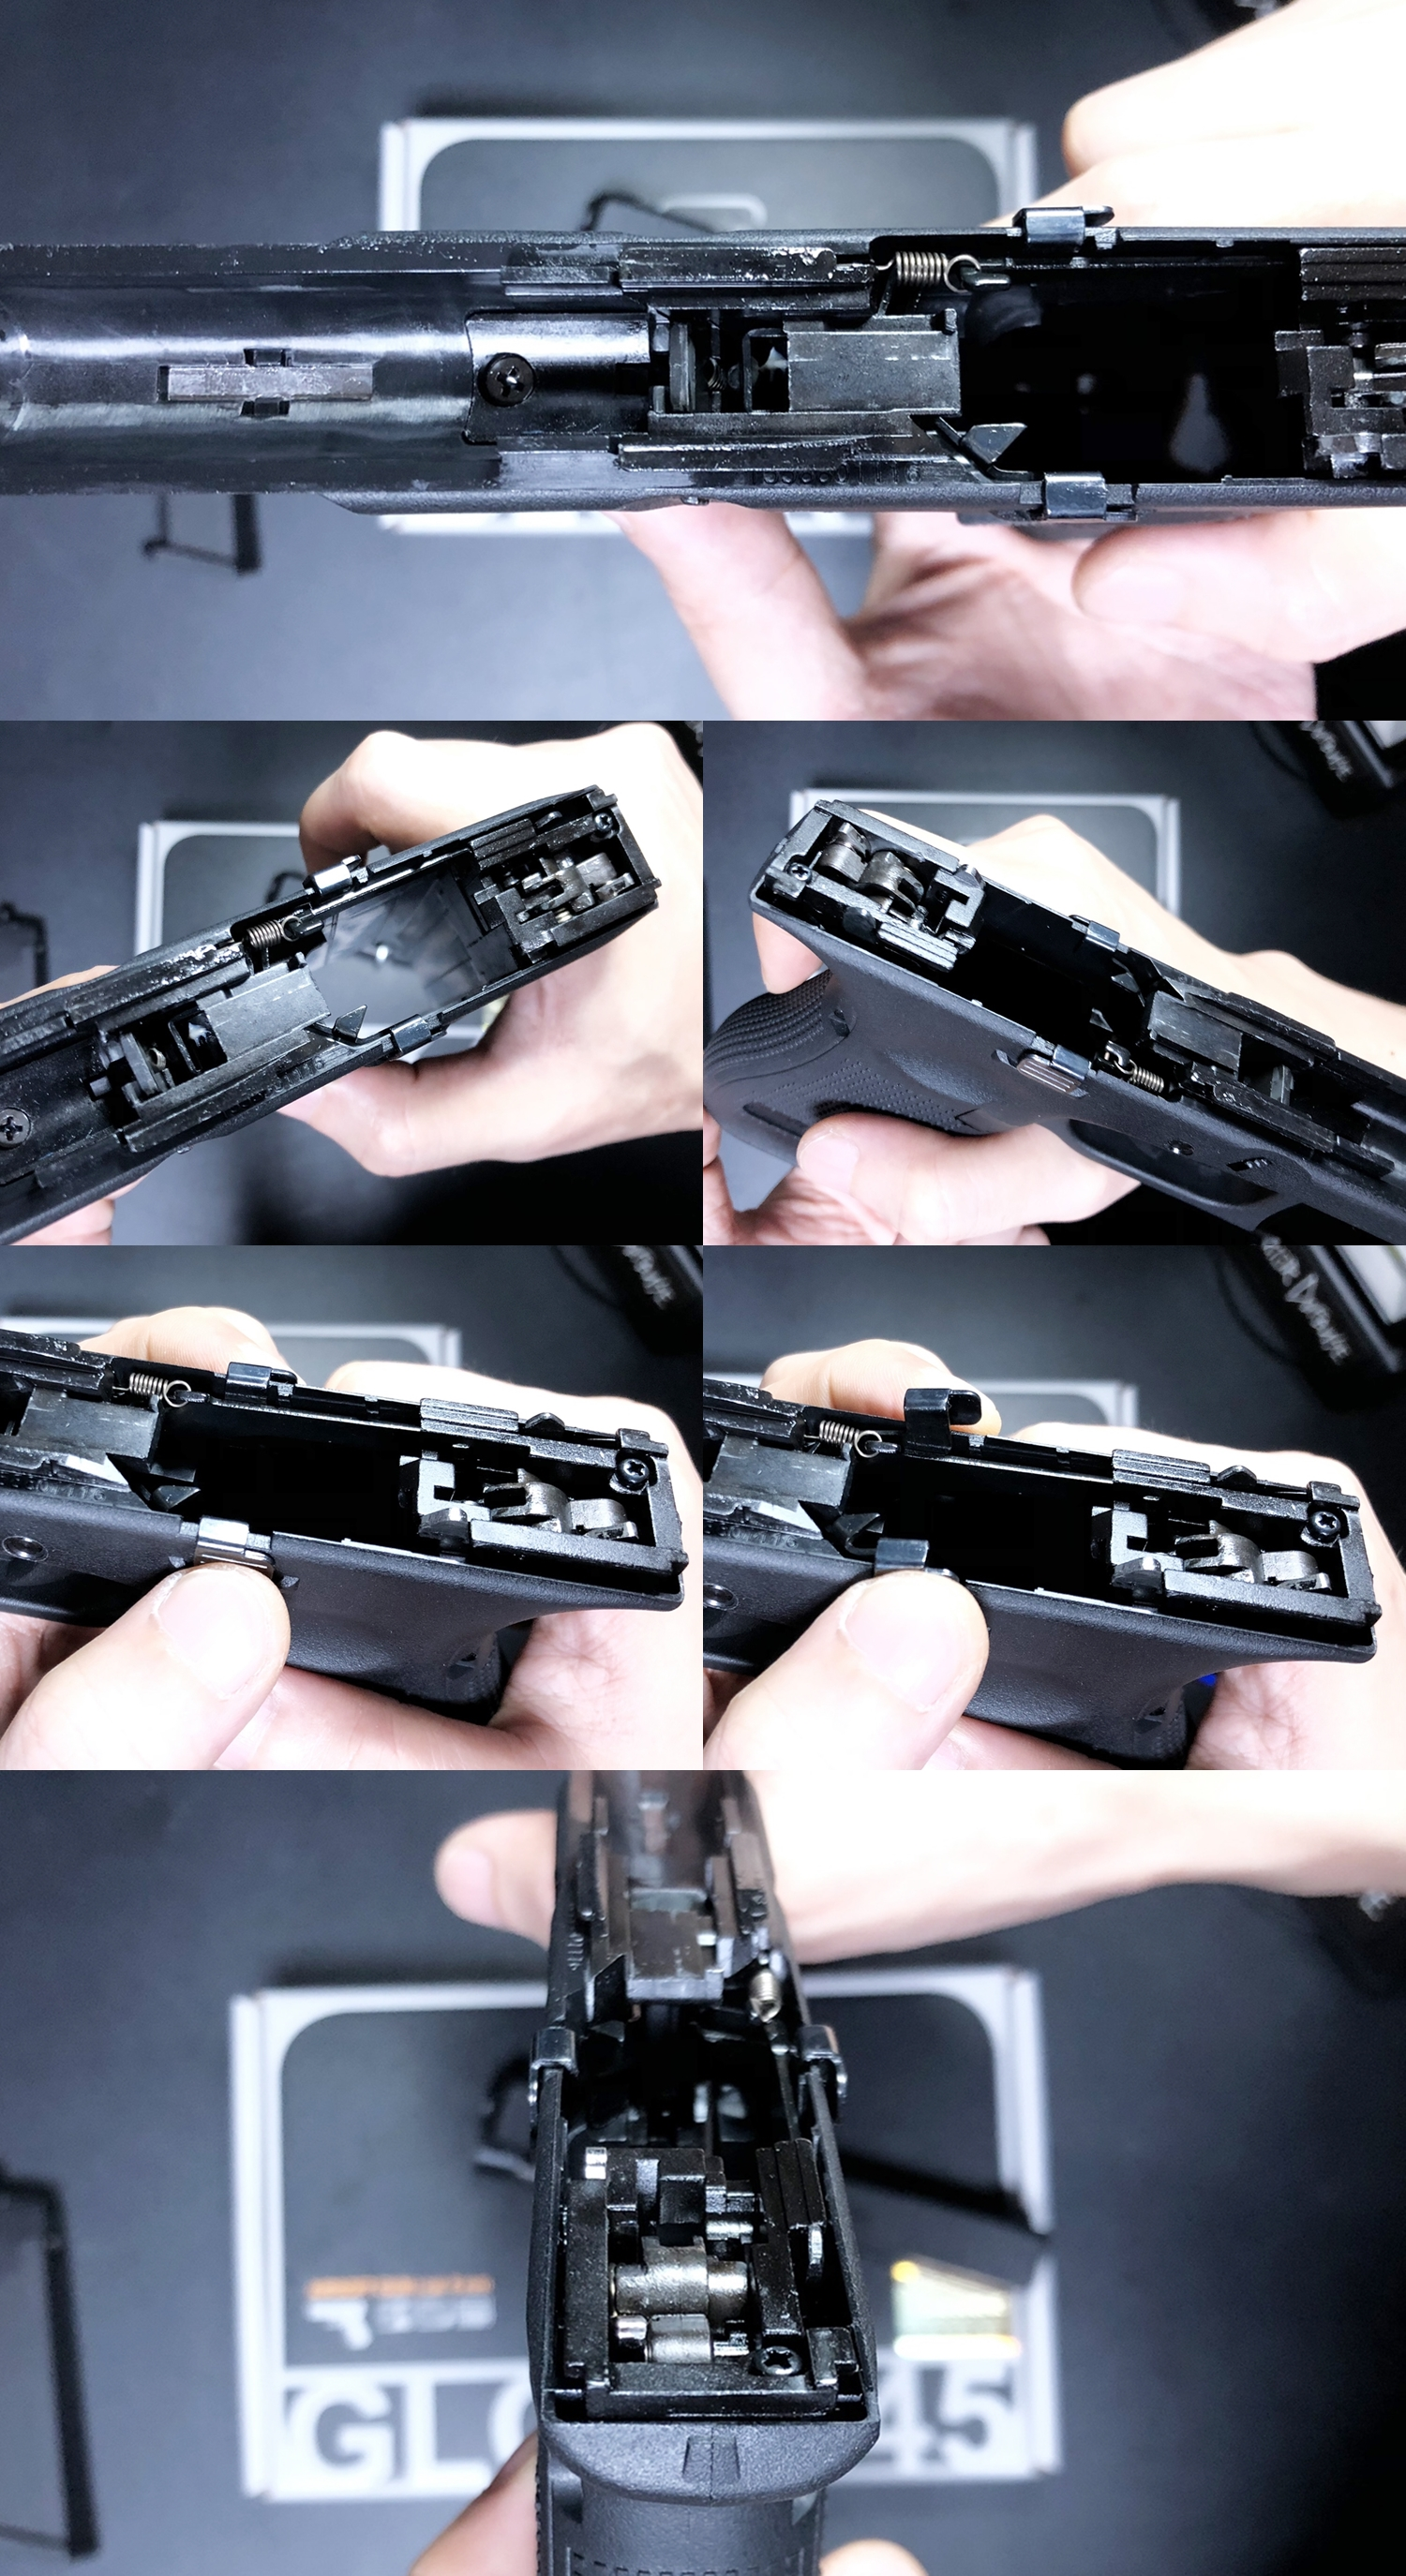 15 UMAREX VFC GLOCK G45 GBB AIRSOFT!! 噂のウマレックス G45 グロック ガスブローバック!! やっと我が家へ着弾 ~ 新品箱出し編!! 購入 開封 初速 計測 検証 比較 通常分解 組立 カスタム レビュー!!